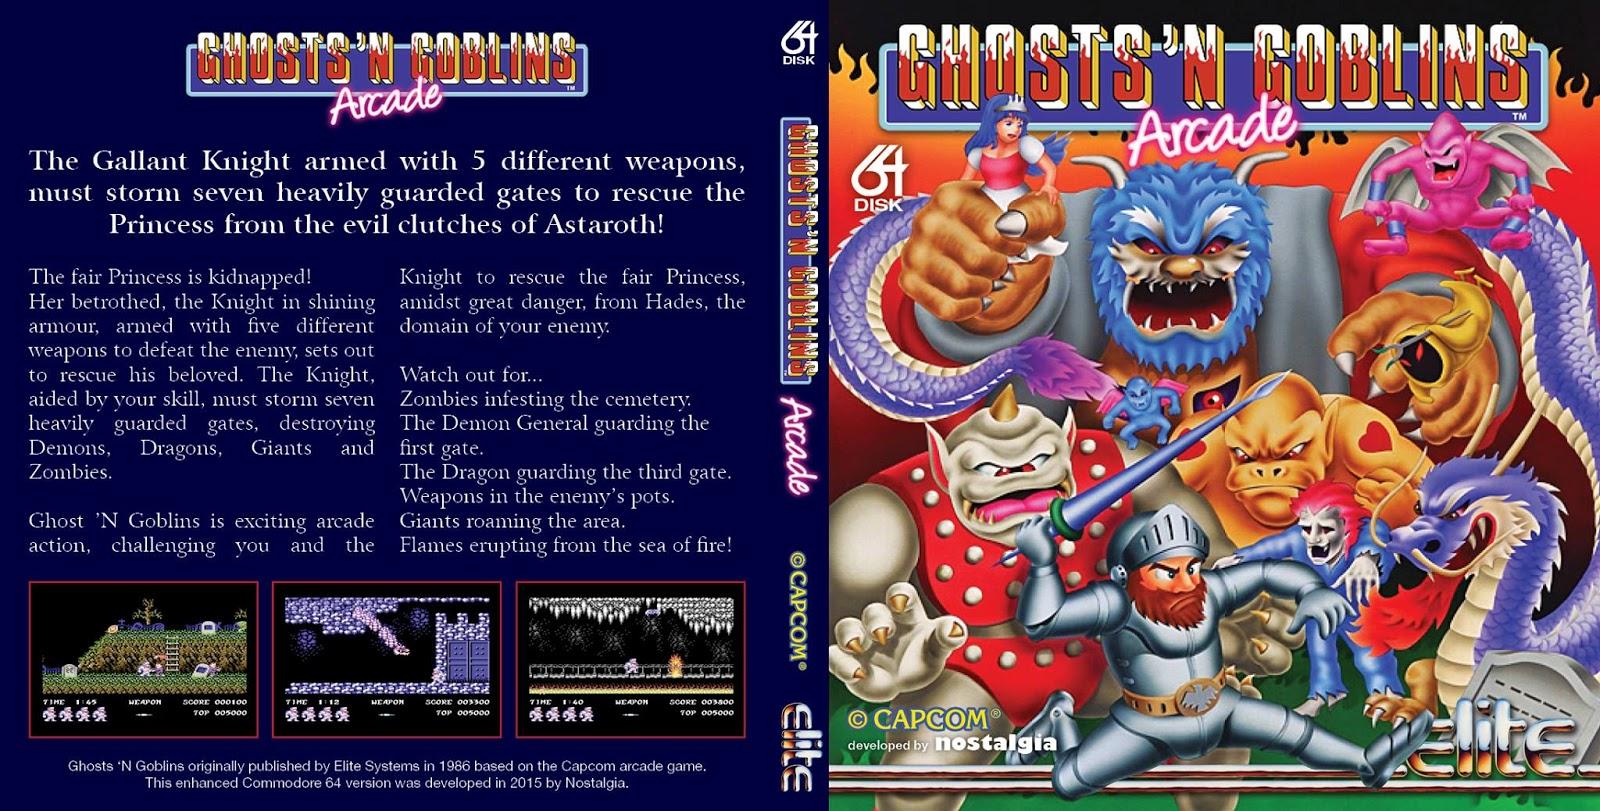 ghosts n goblins arcade 1985